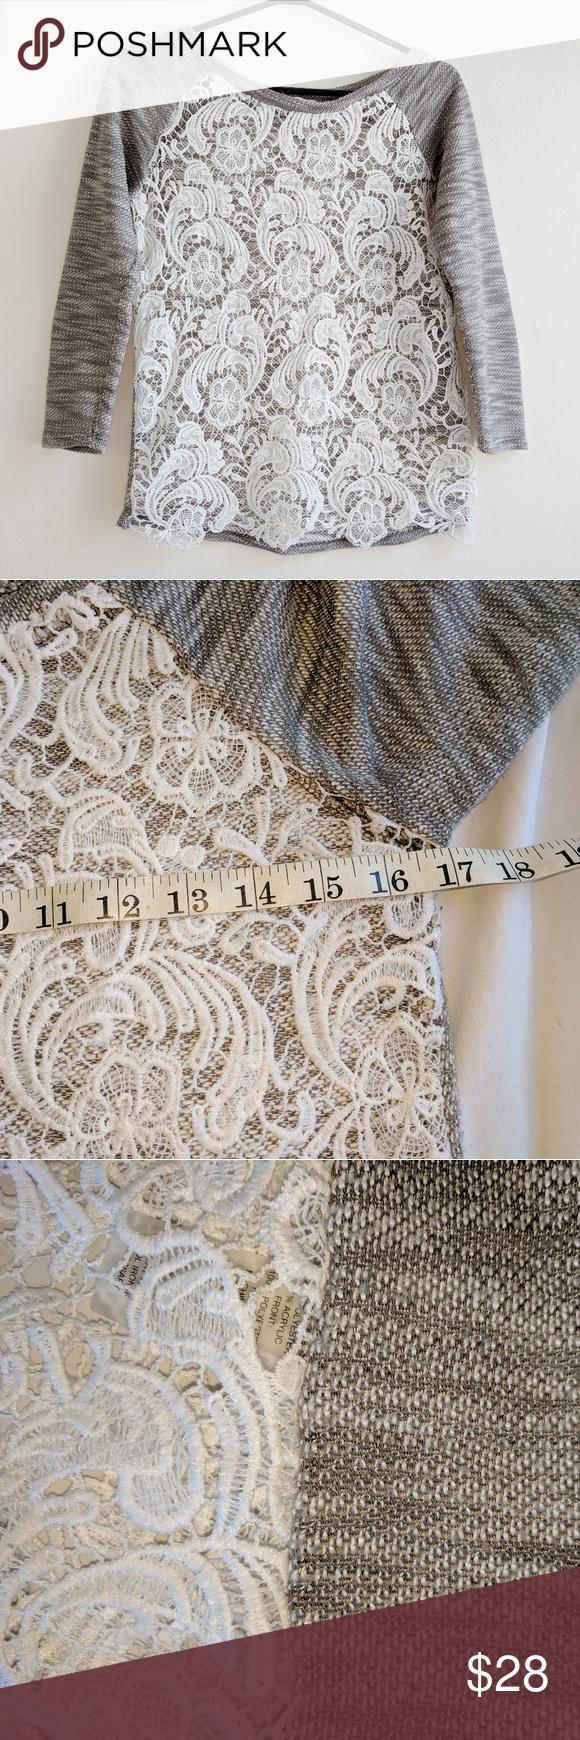 Angela Ferlaino 211 best my posh picks images in 2019 | fashion trends